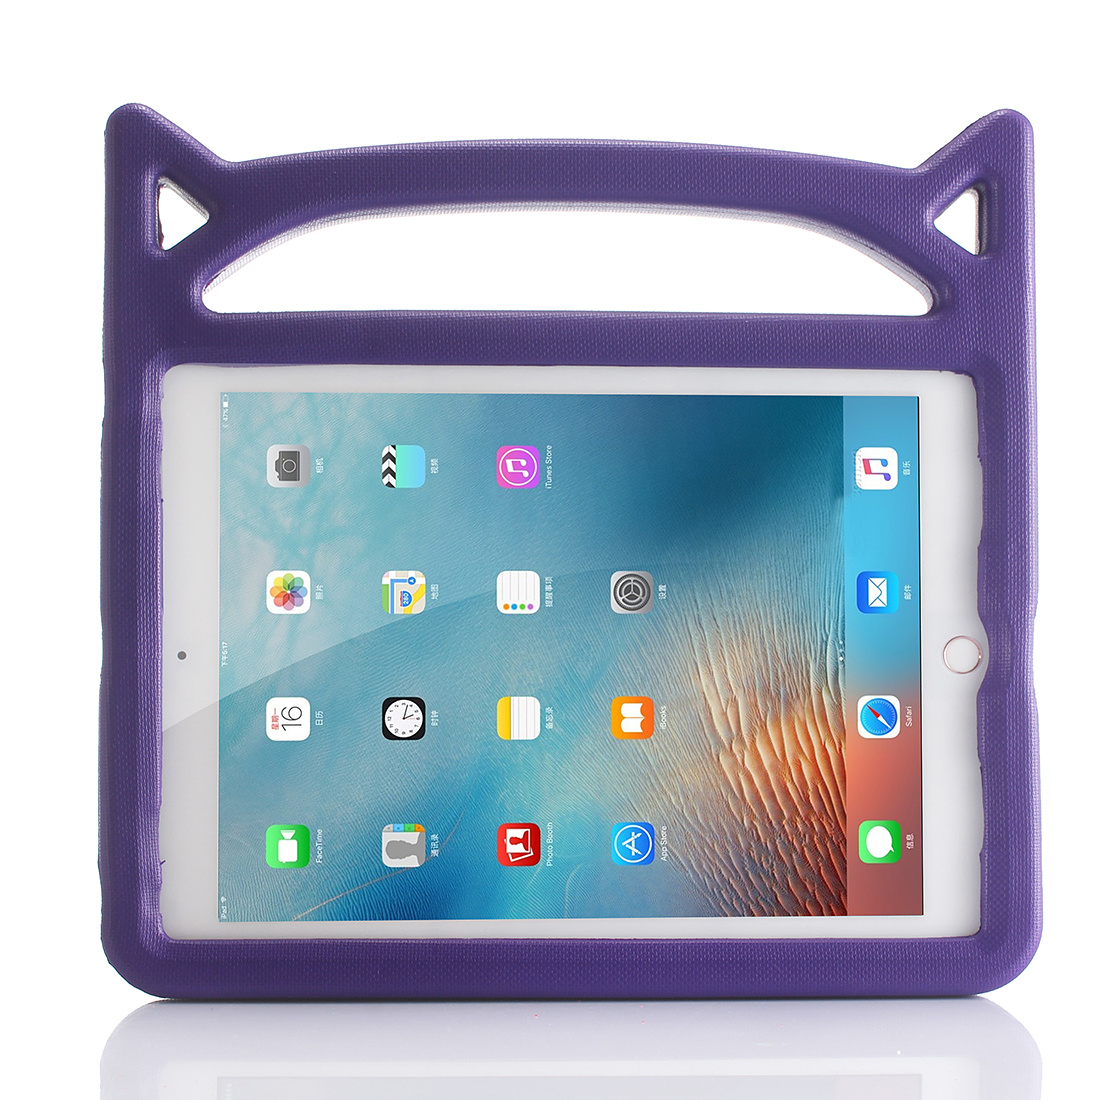 Barnfodral med ställ till iPad Air/Air2/iPad 9.7, lila